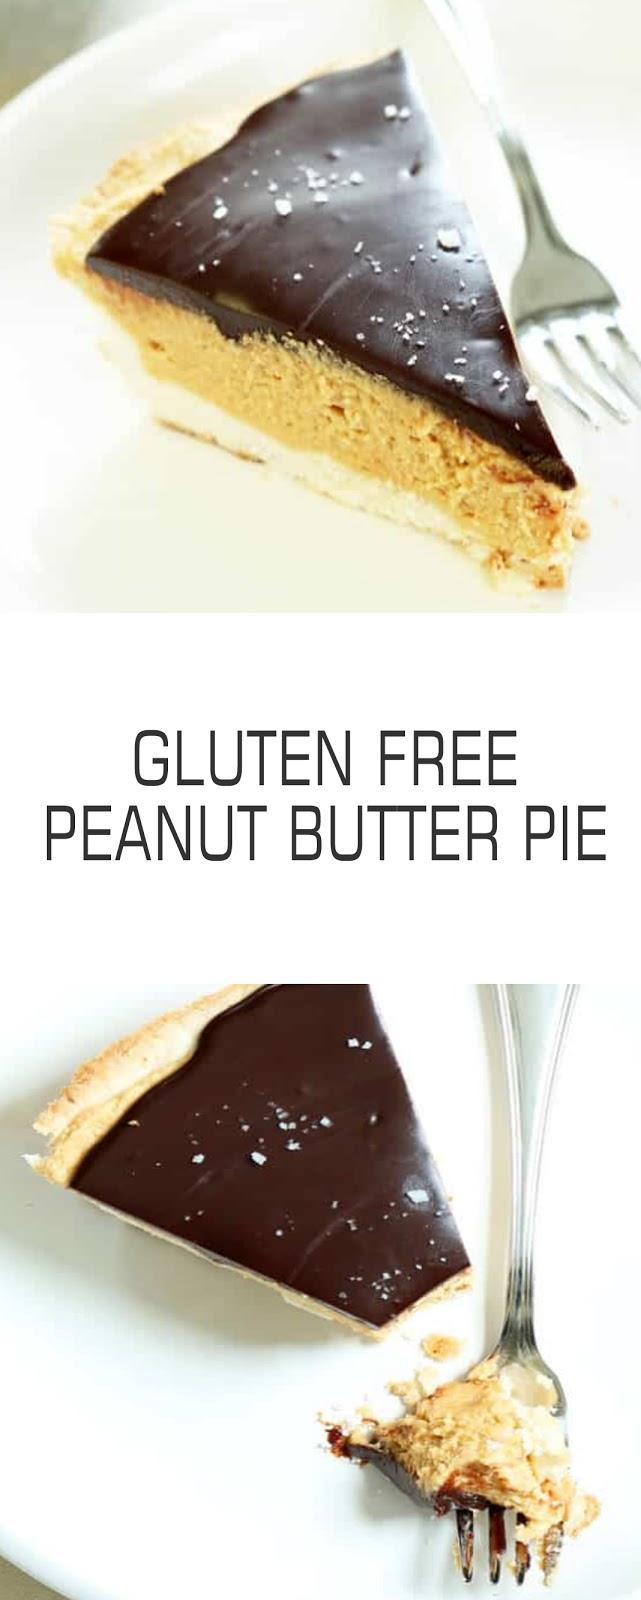 Recipe Gluten Free Peanut Butter Pie #pie #cookies